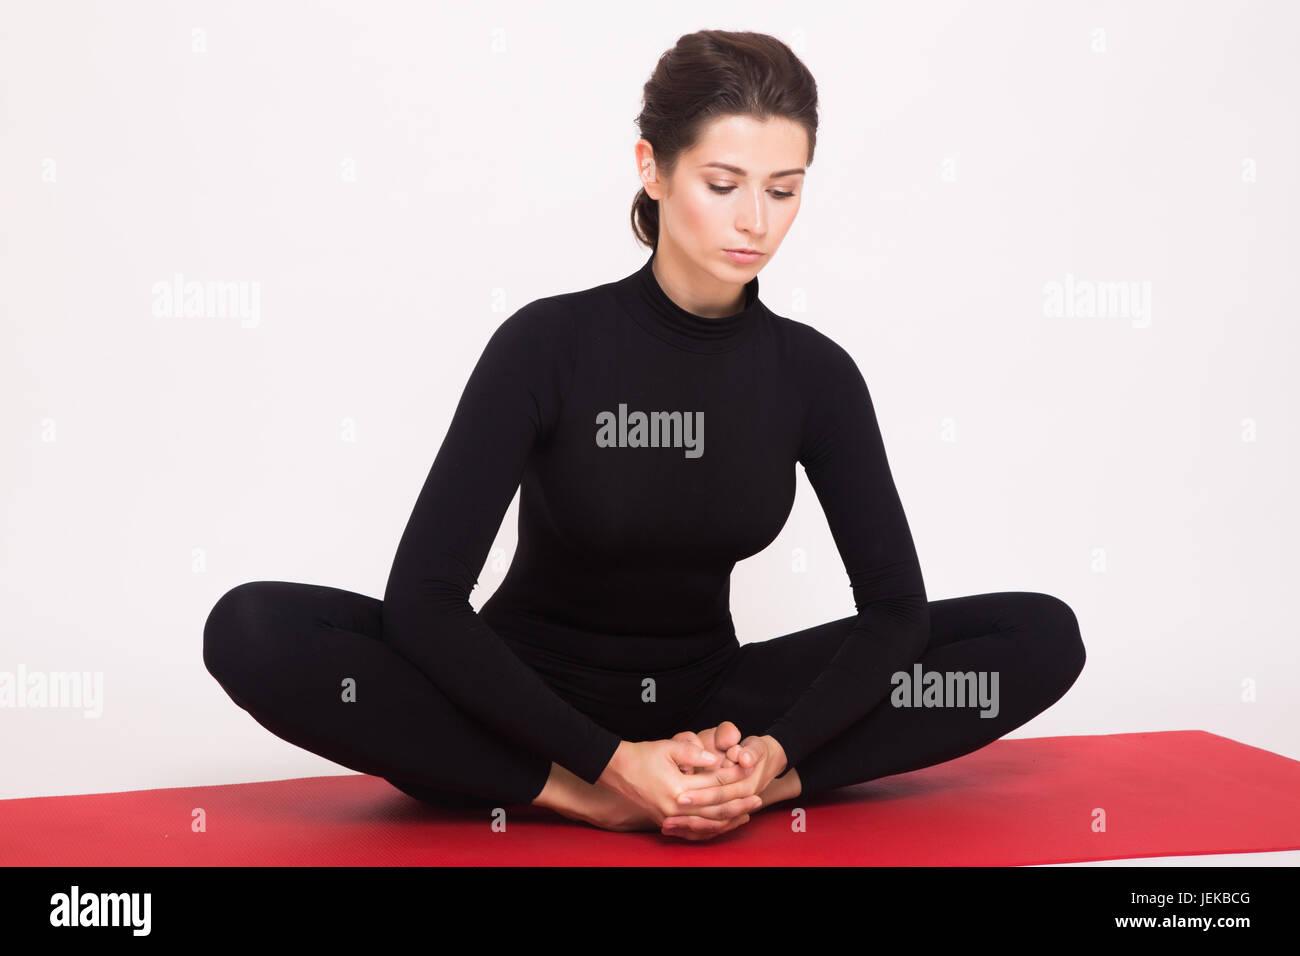 Beautiful athletic girl in black suit doing yoga asanas. Isolated on white background. - Stock Image